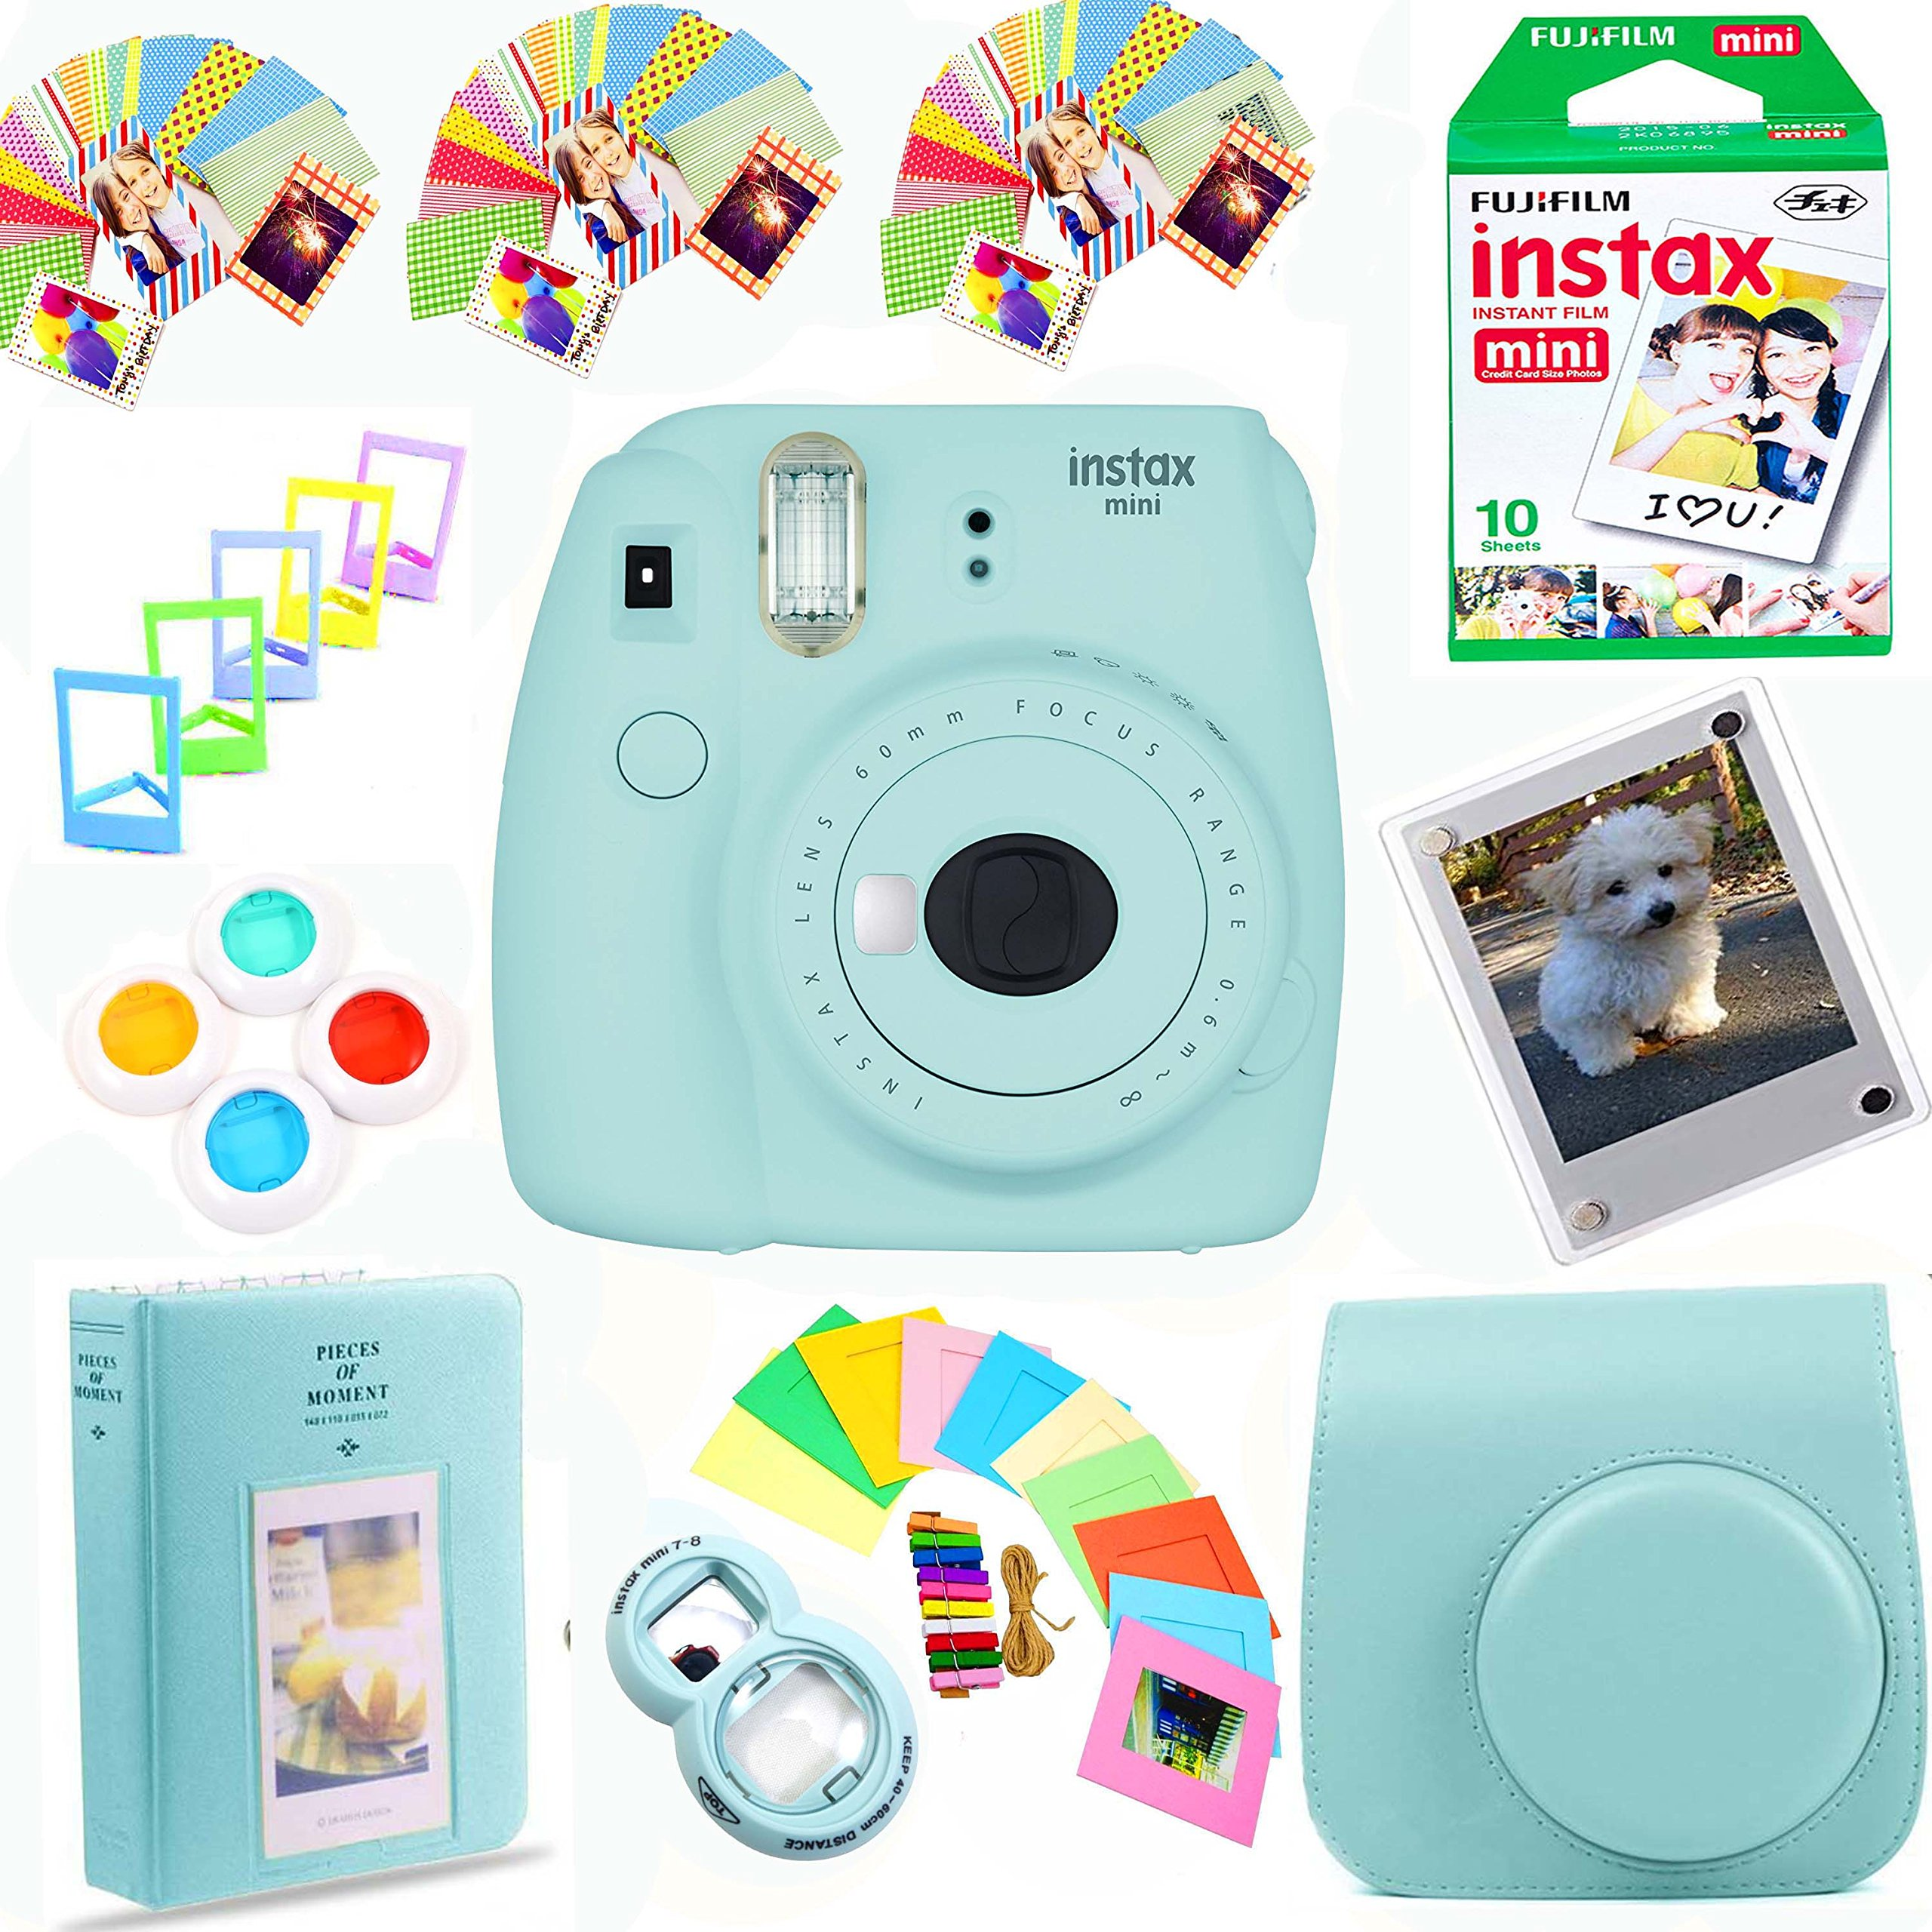 Fujifilm Instax Mini 9 Instant Film Camera (Ice Blue) + Instax Film (10 Shots) + Photix Pleather Case + 64 Pocket Album+ Photix Self-Standing Frames + Stick-on Frames Exclusive Instax Design Bundle by The Tech Expert